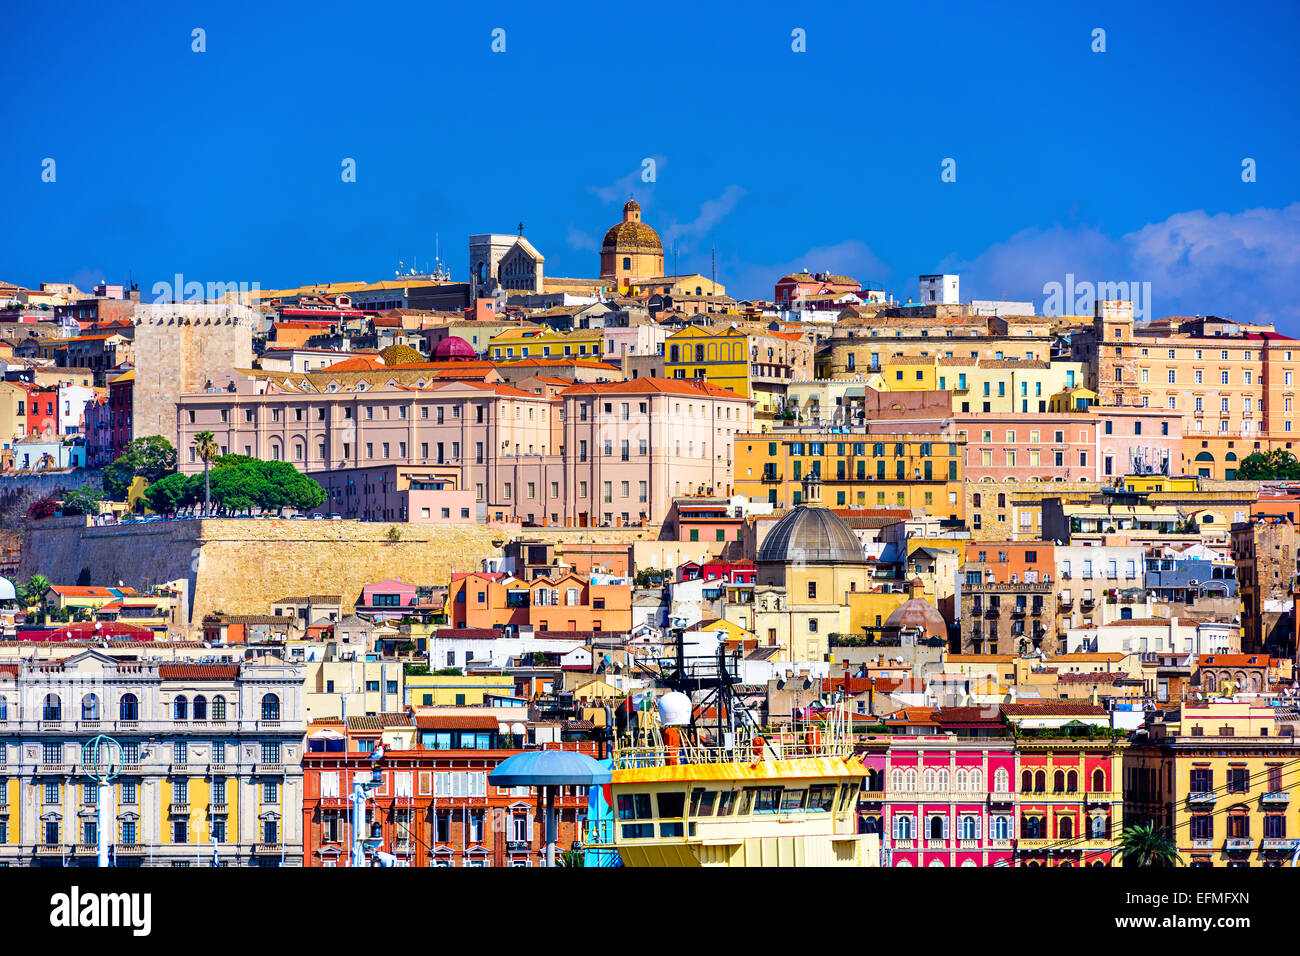 Cagliari, Sardinia, Italy old town skyline. - Stock Image